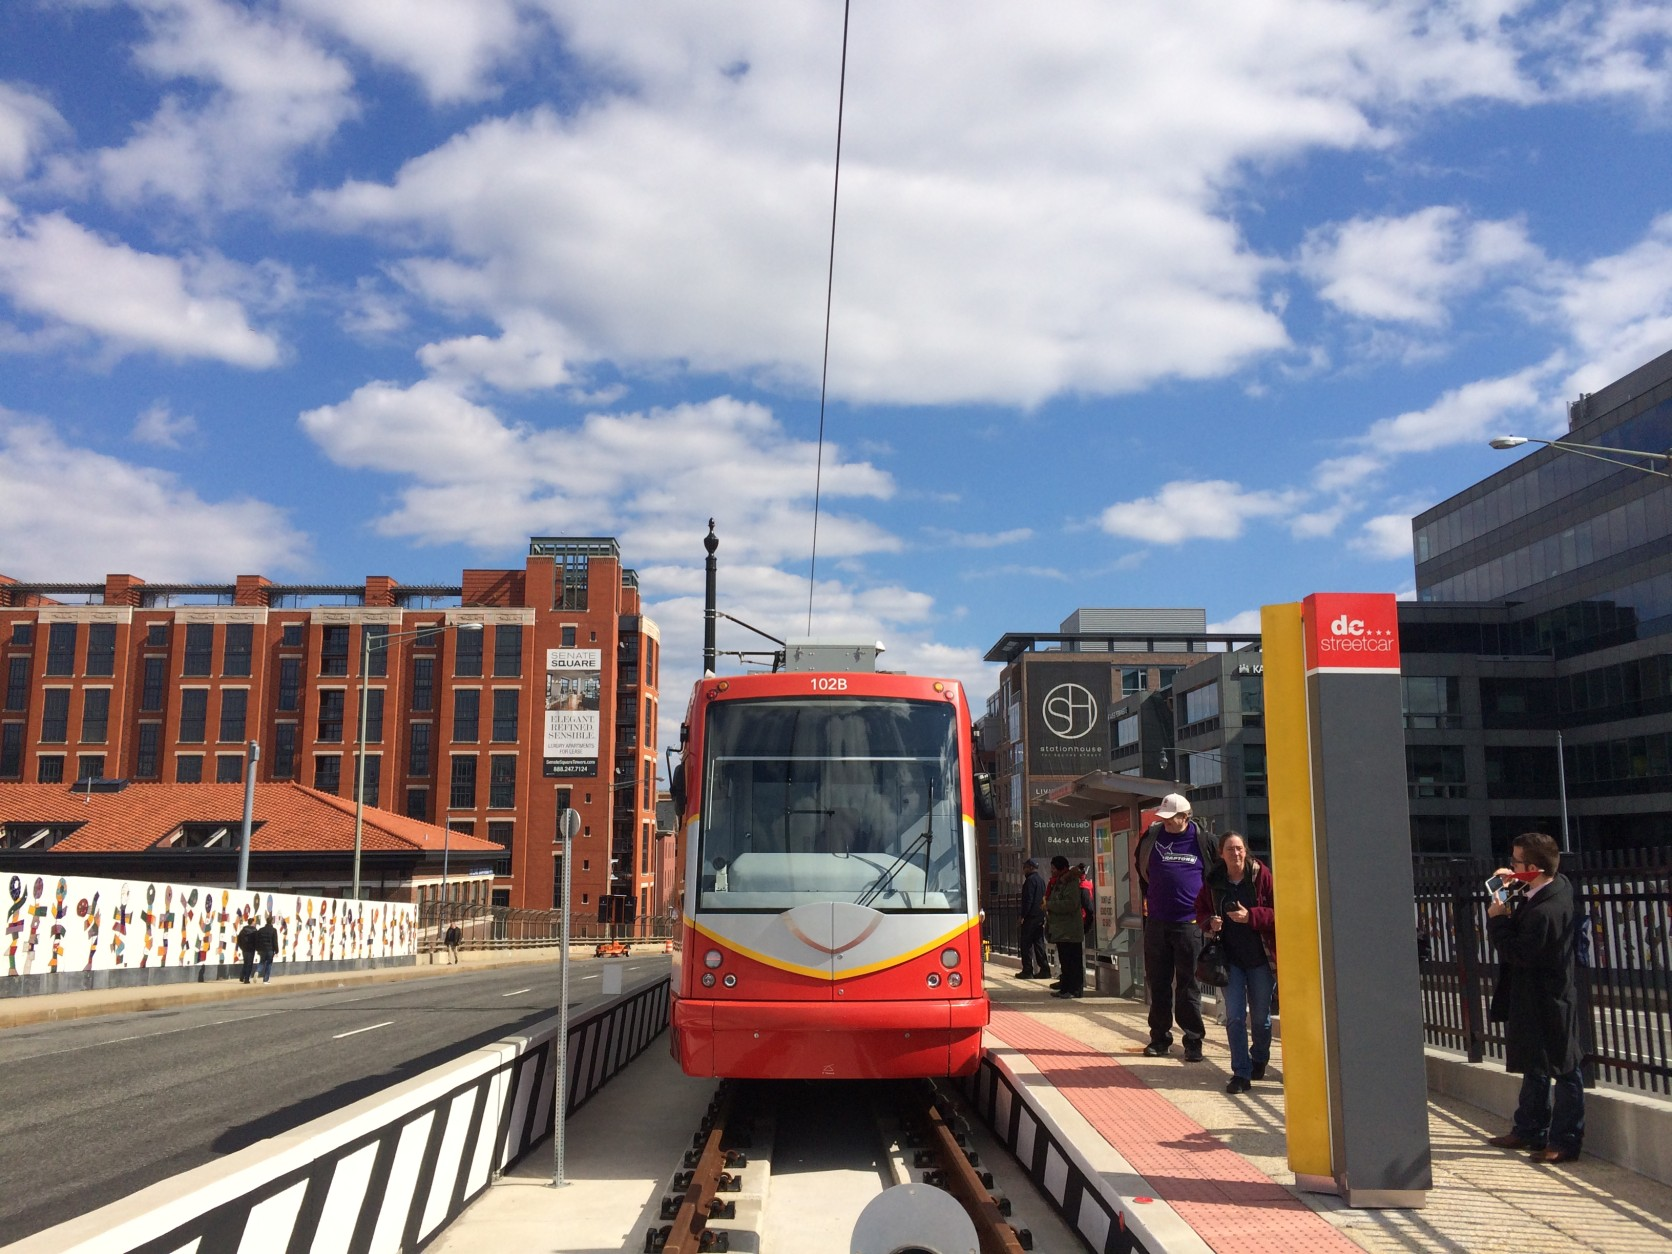 d.c. streetcar